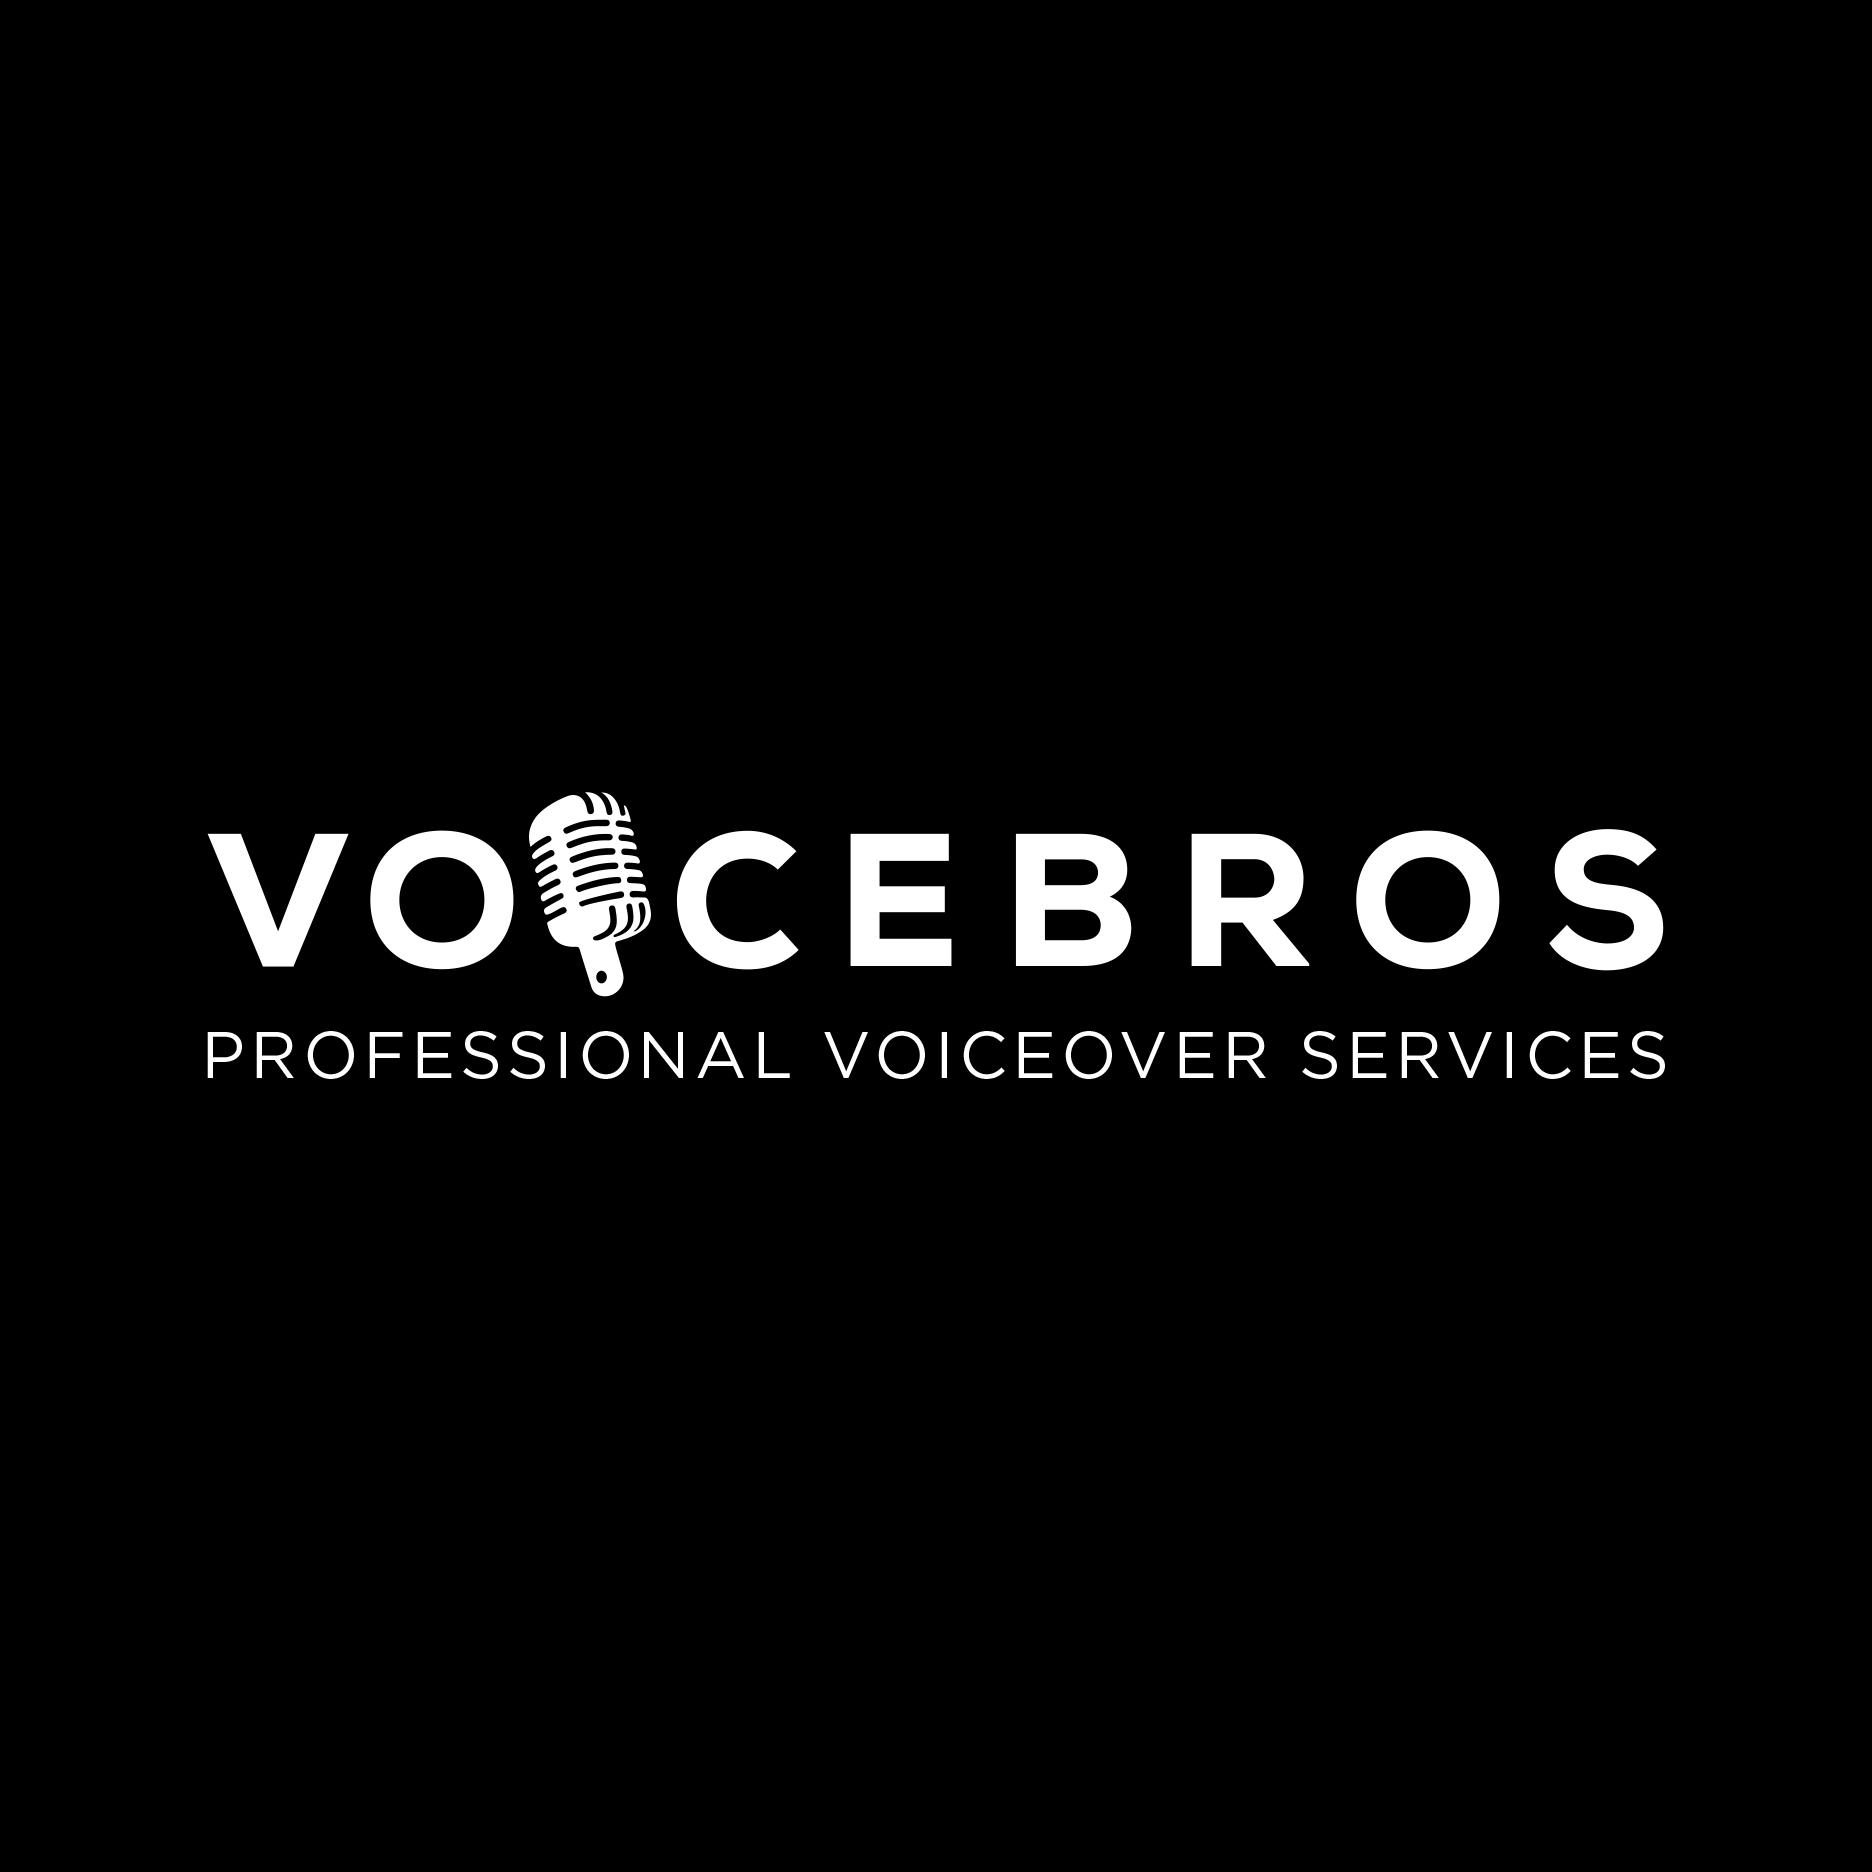 Sato Sugar~さとシュガー is a voice over actor